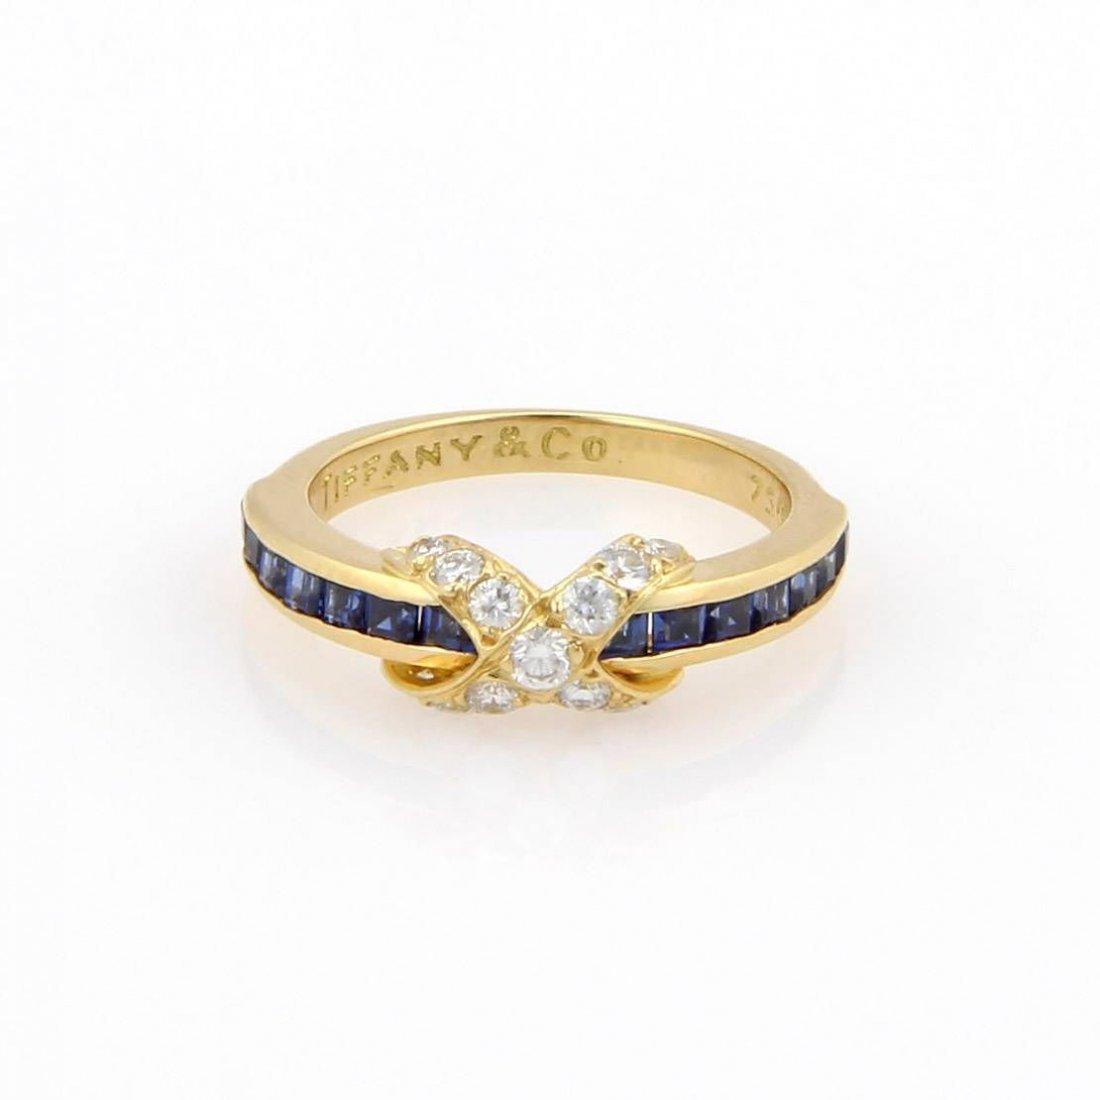 Tiffany & Co. 18K Yellow Gold Sapphire & Diamond